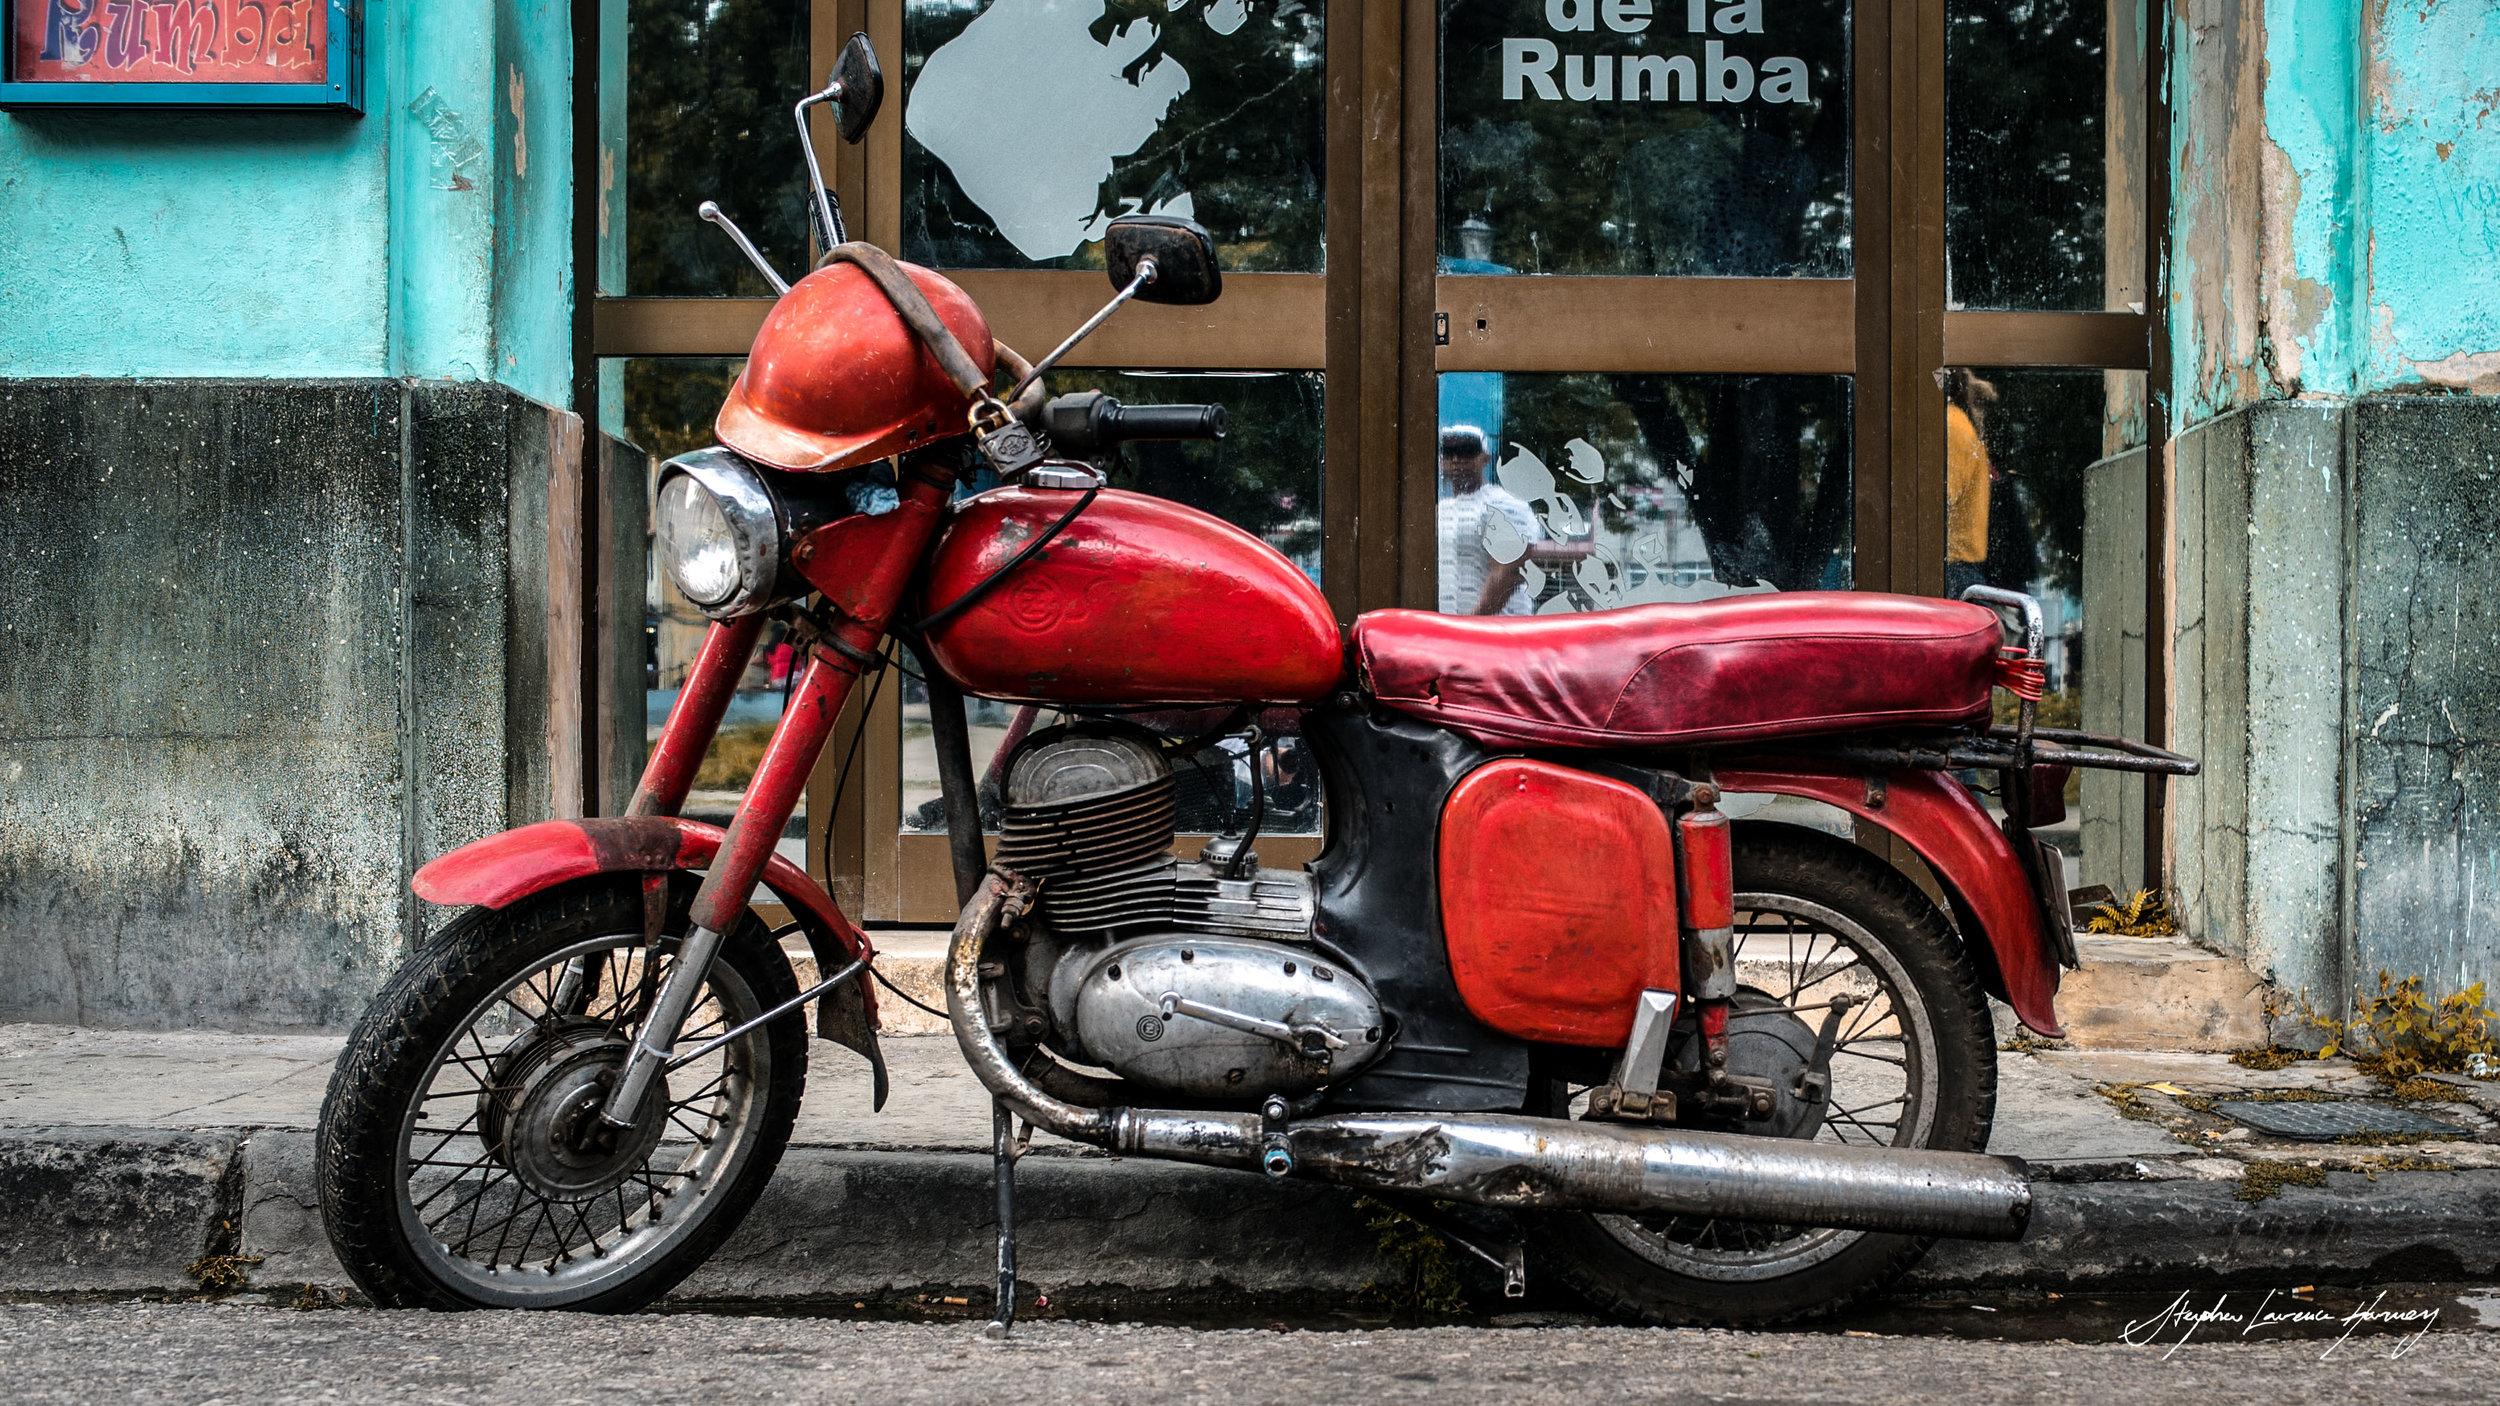 CUBA motorbike red (1 of 1).jpg